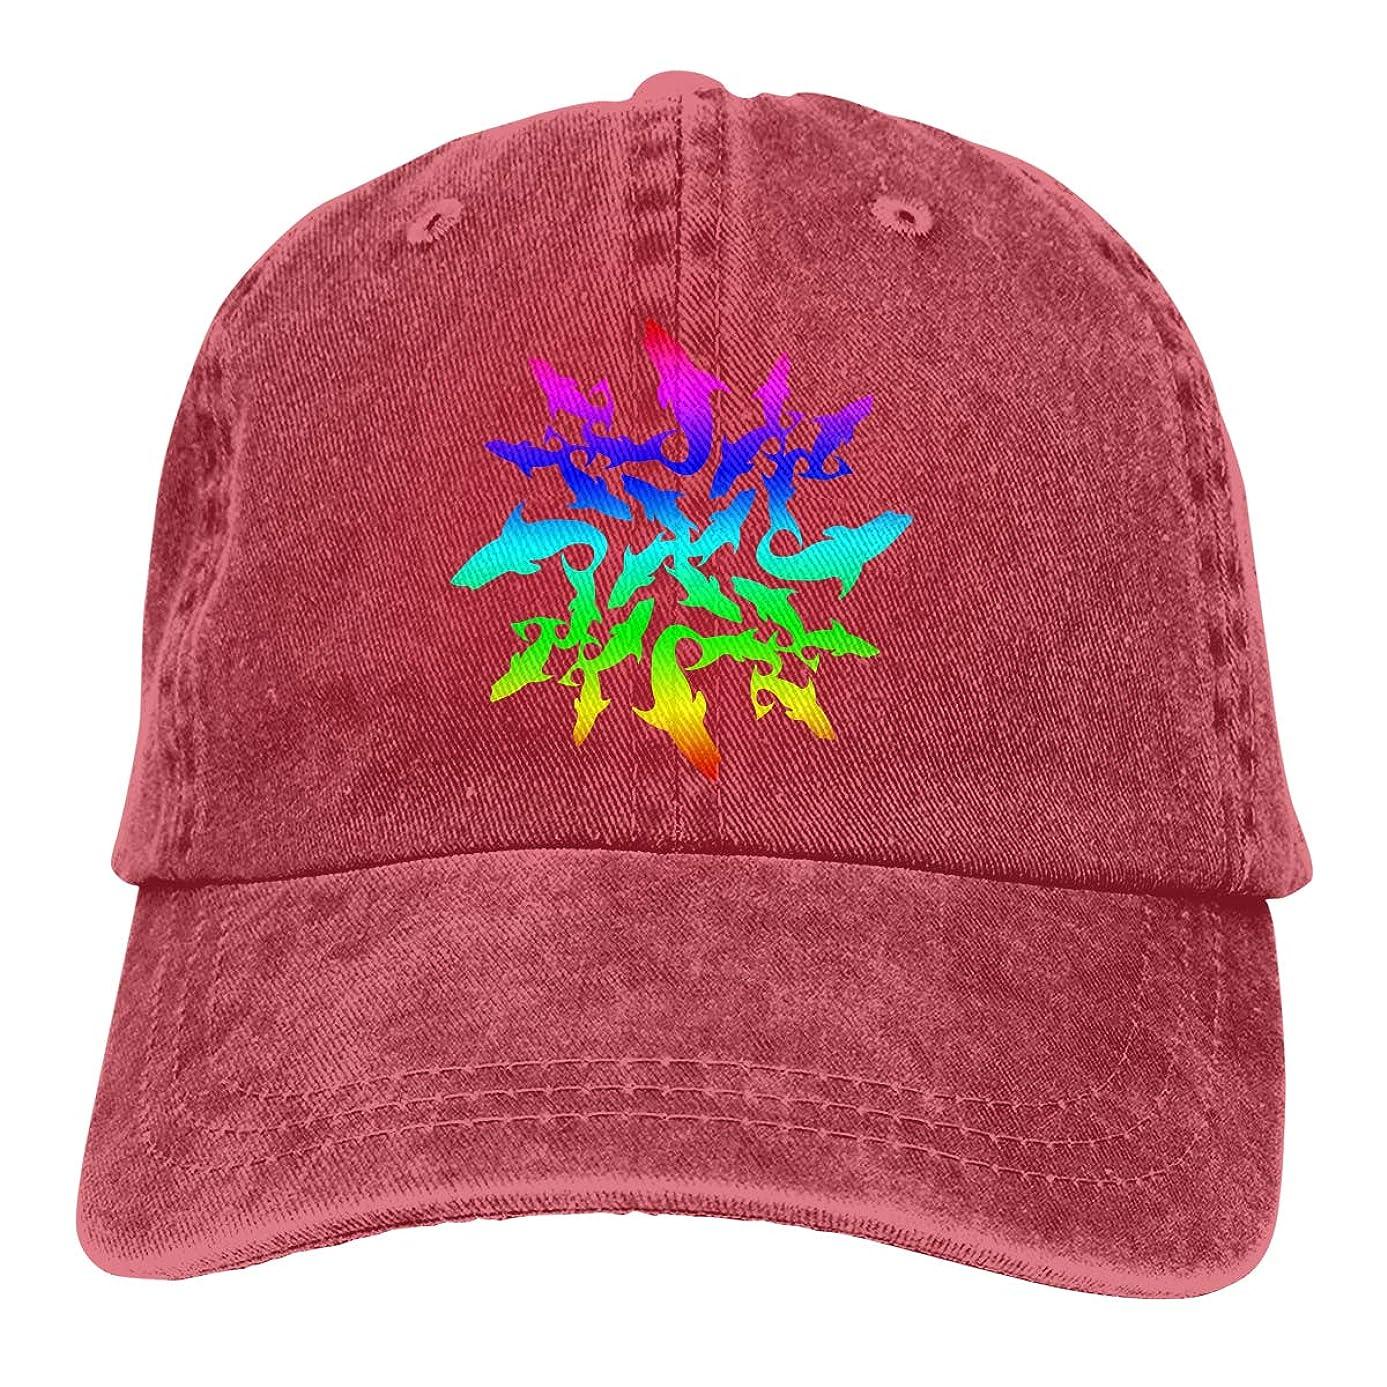 Shark Circle-6 Cute Adjustable Cap for Men&Women 100% Cotton Black